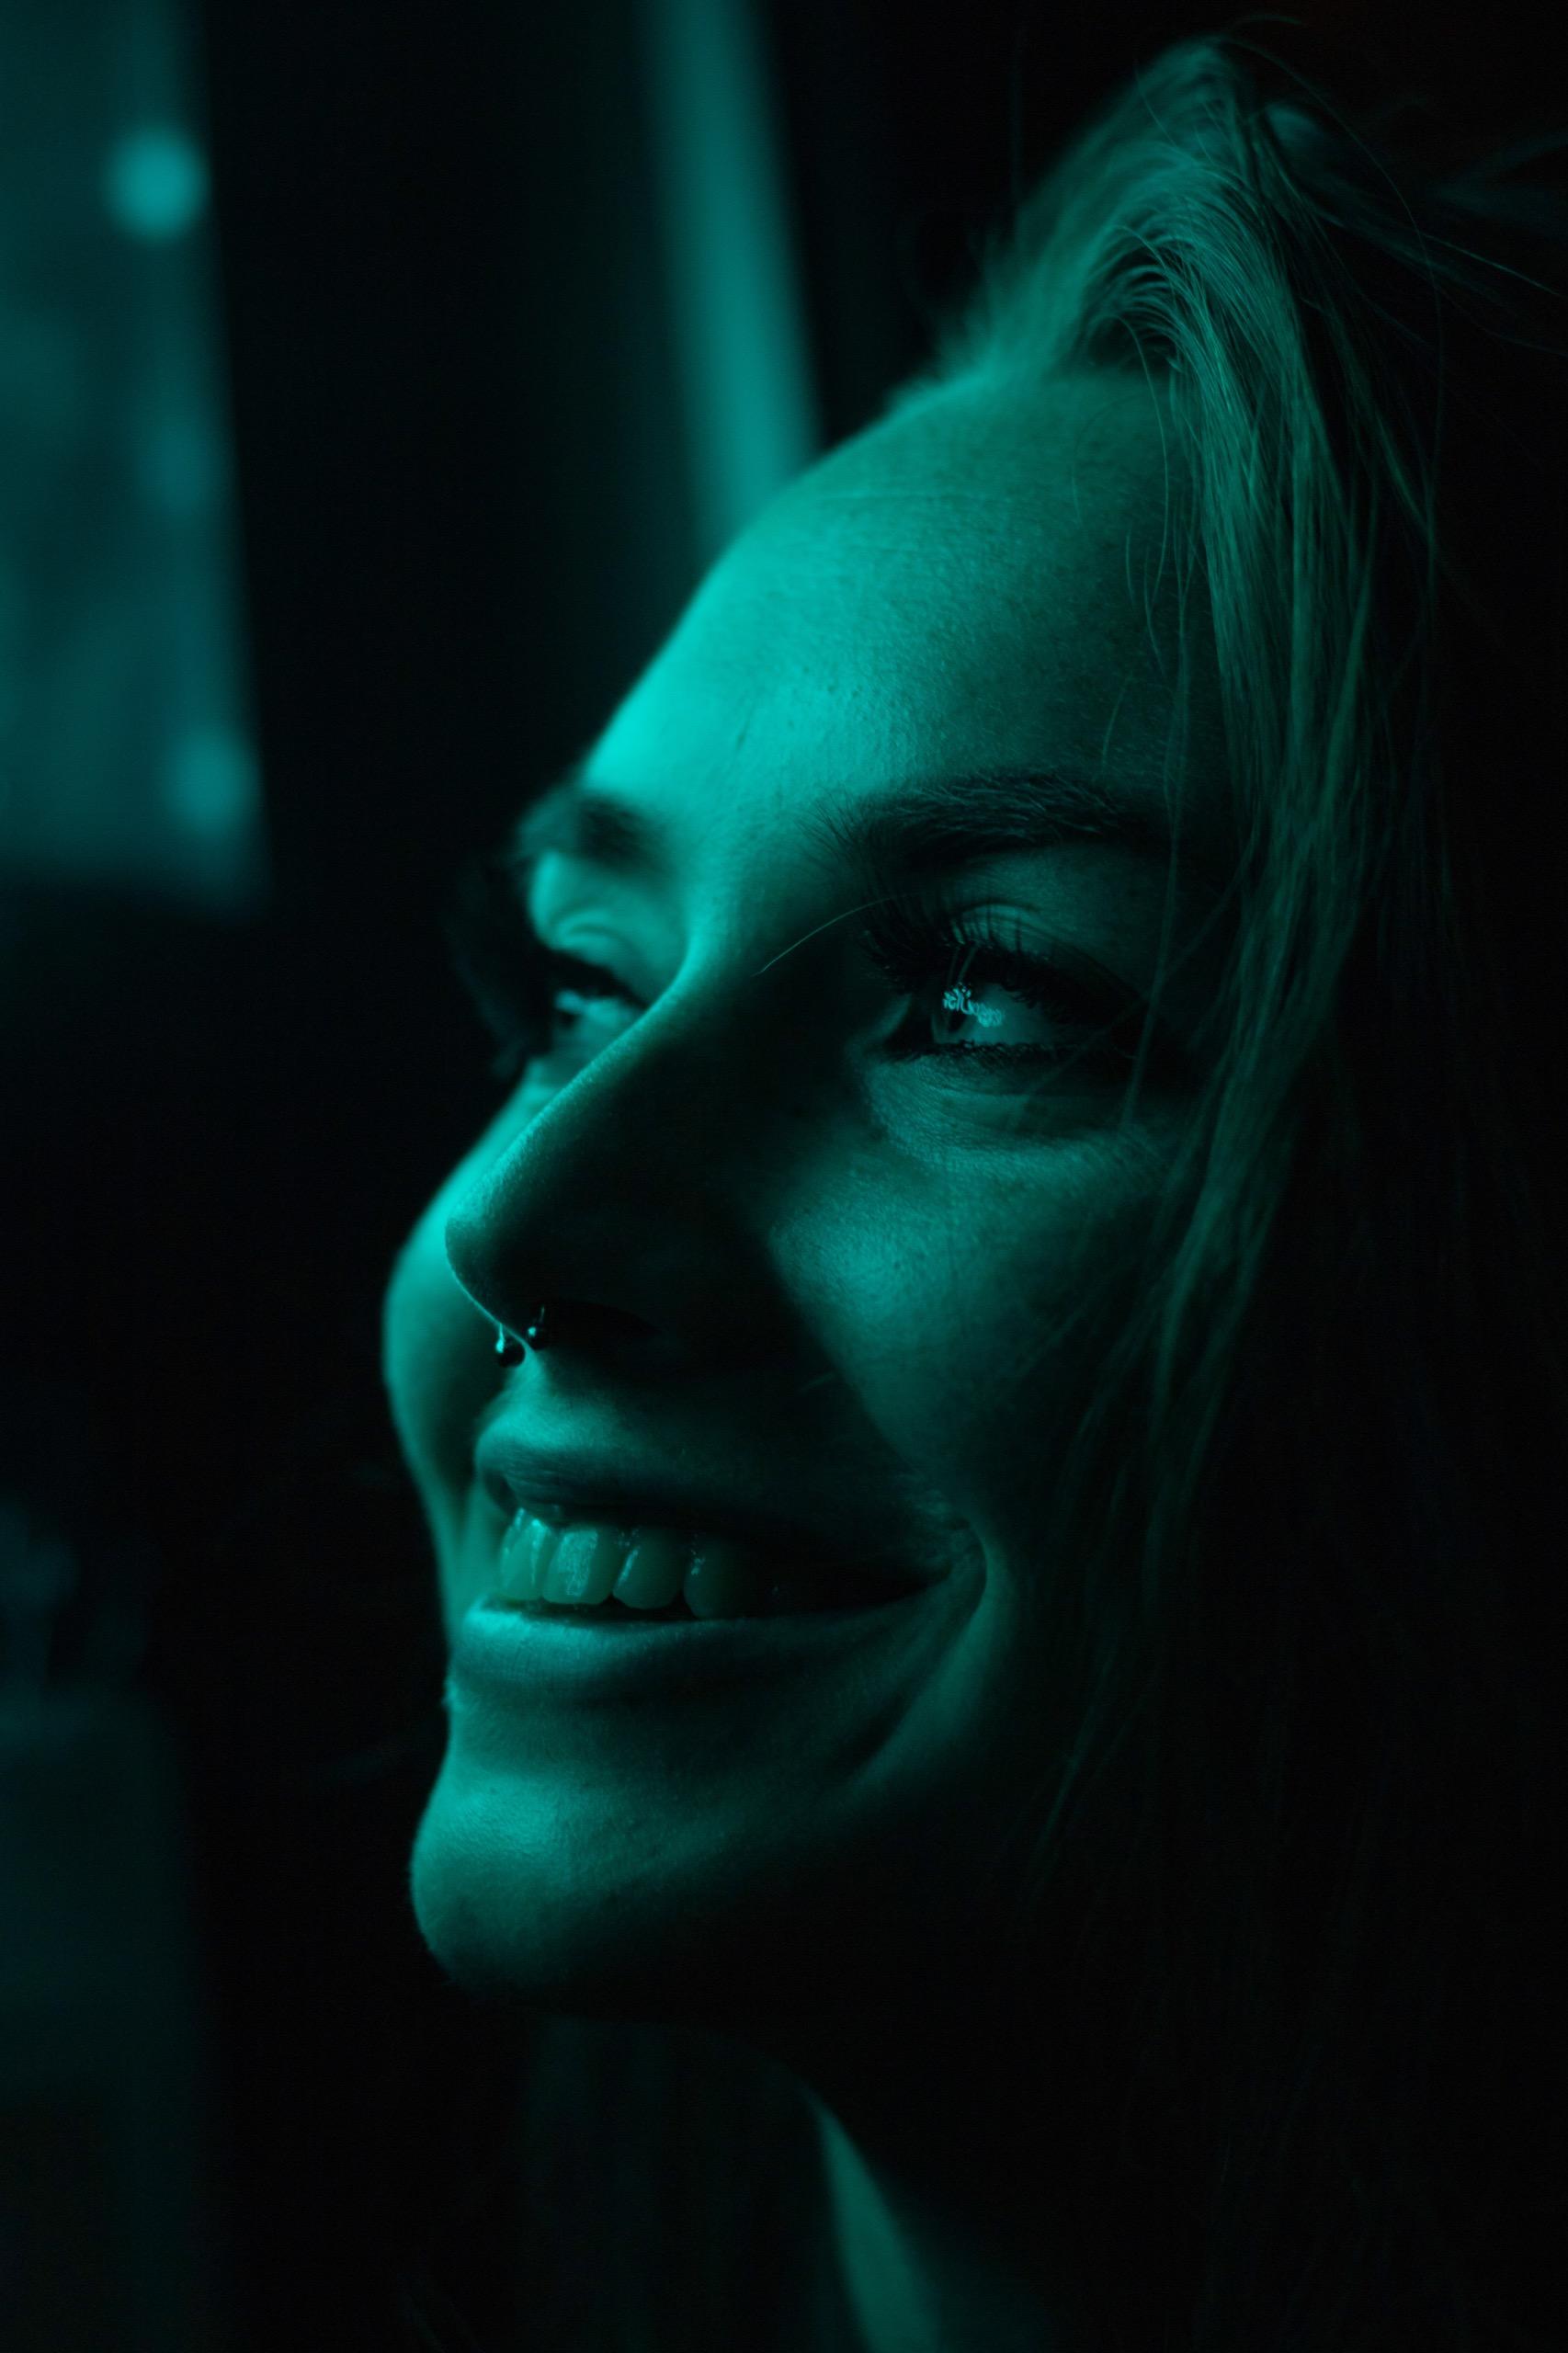 beautiful woman smiling oral health